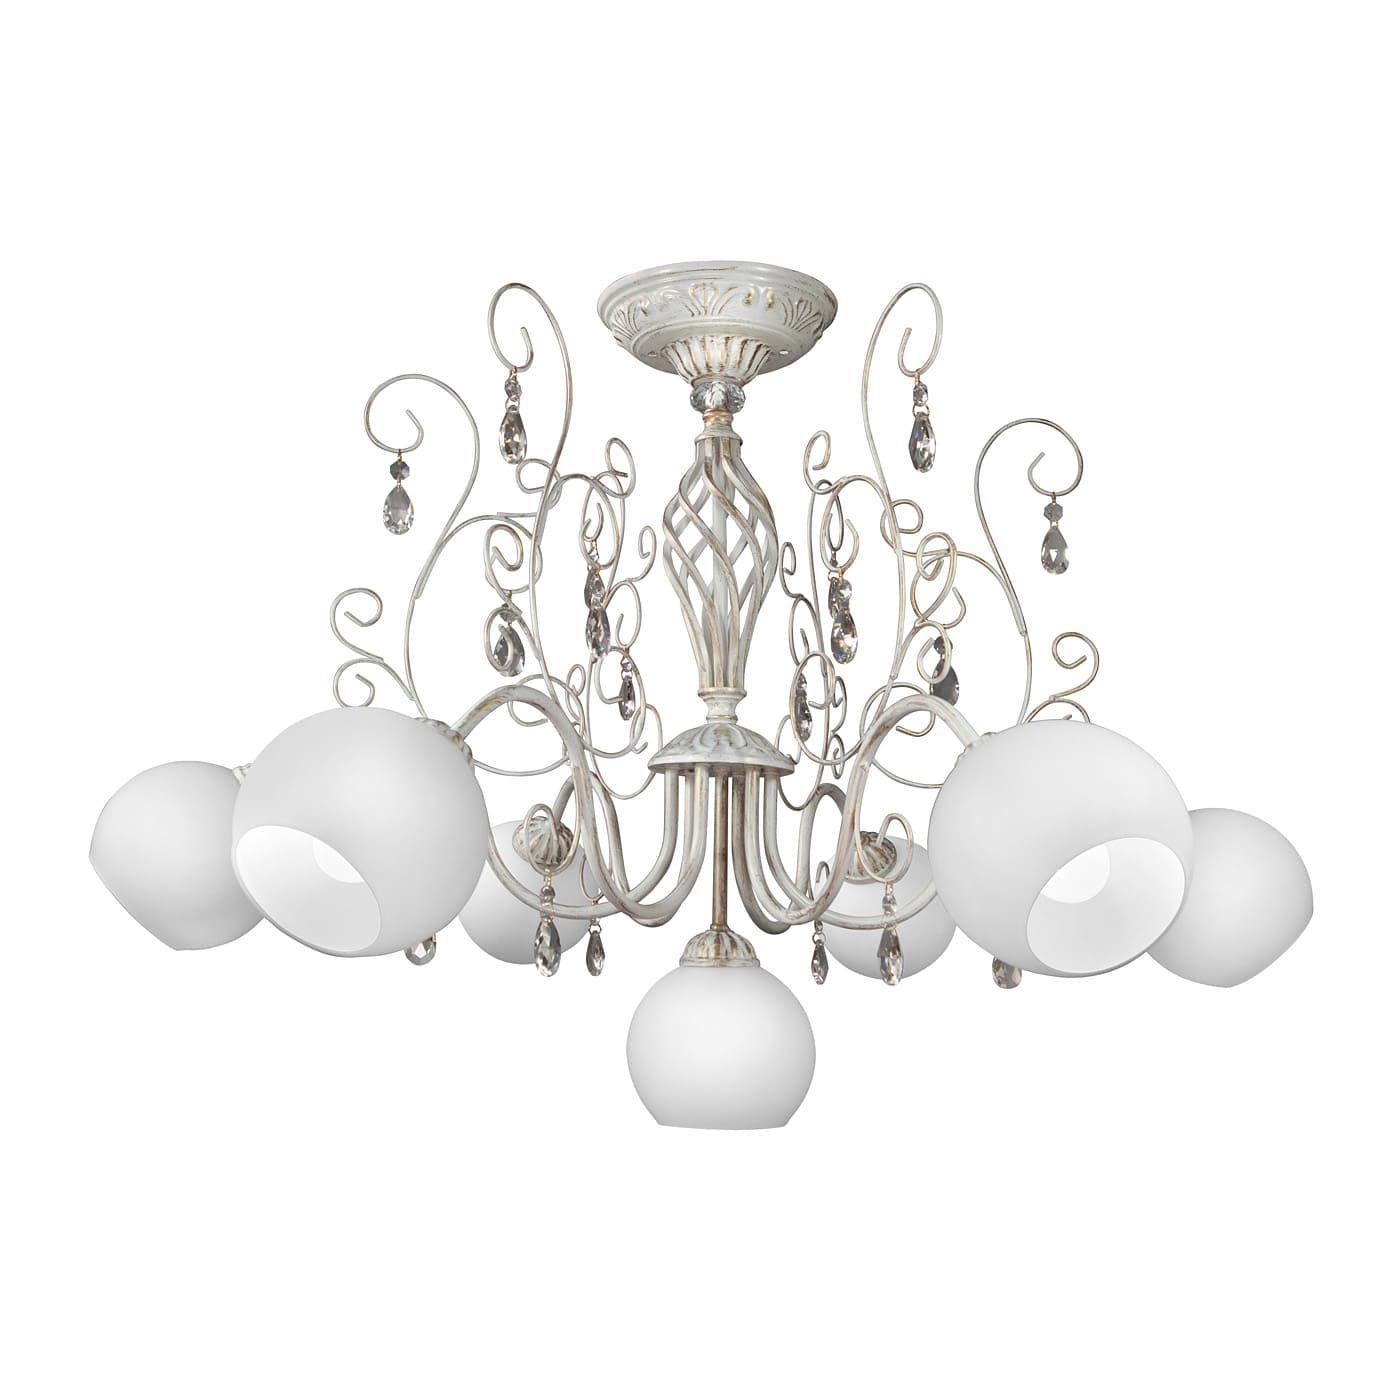 PETRASVET / Ceiling chandelier S2405-7, 7xE27 max. 60W